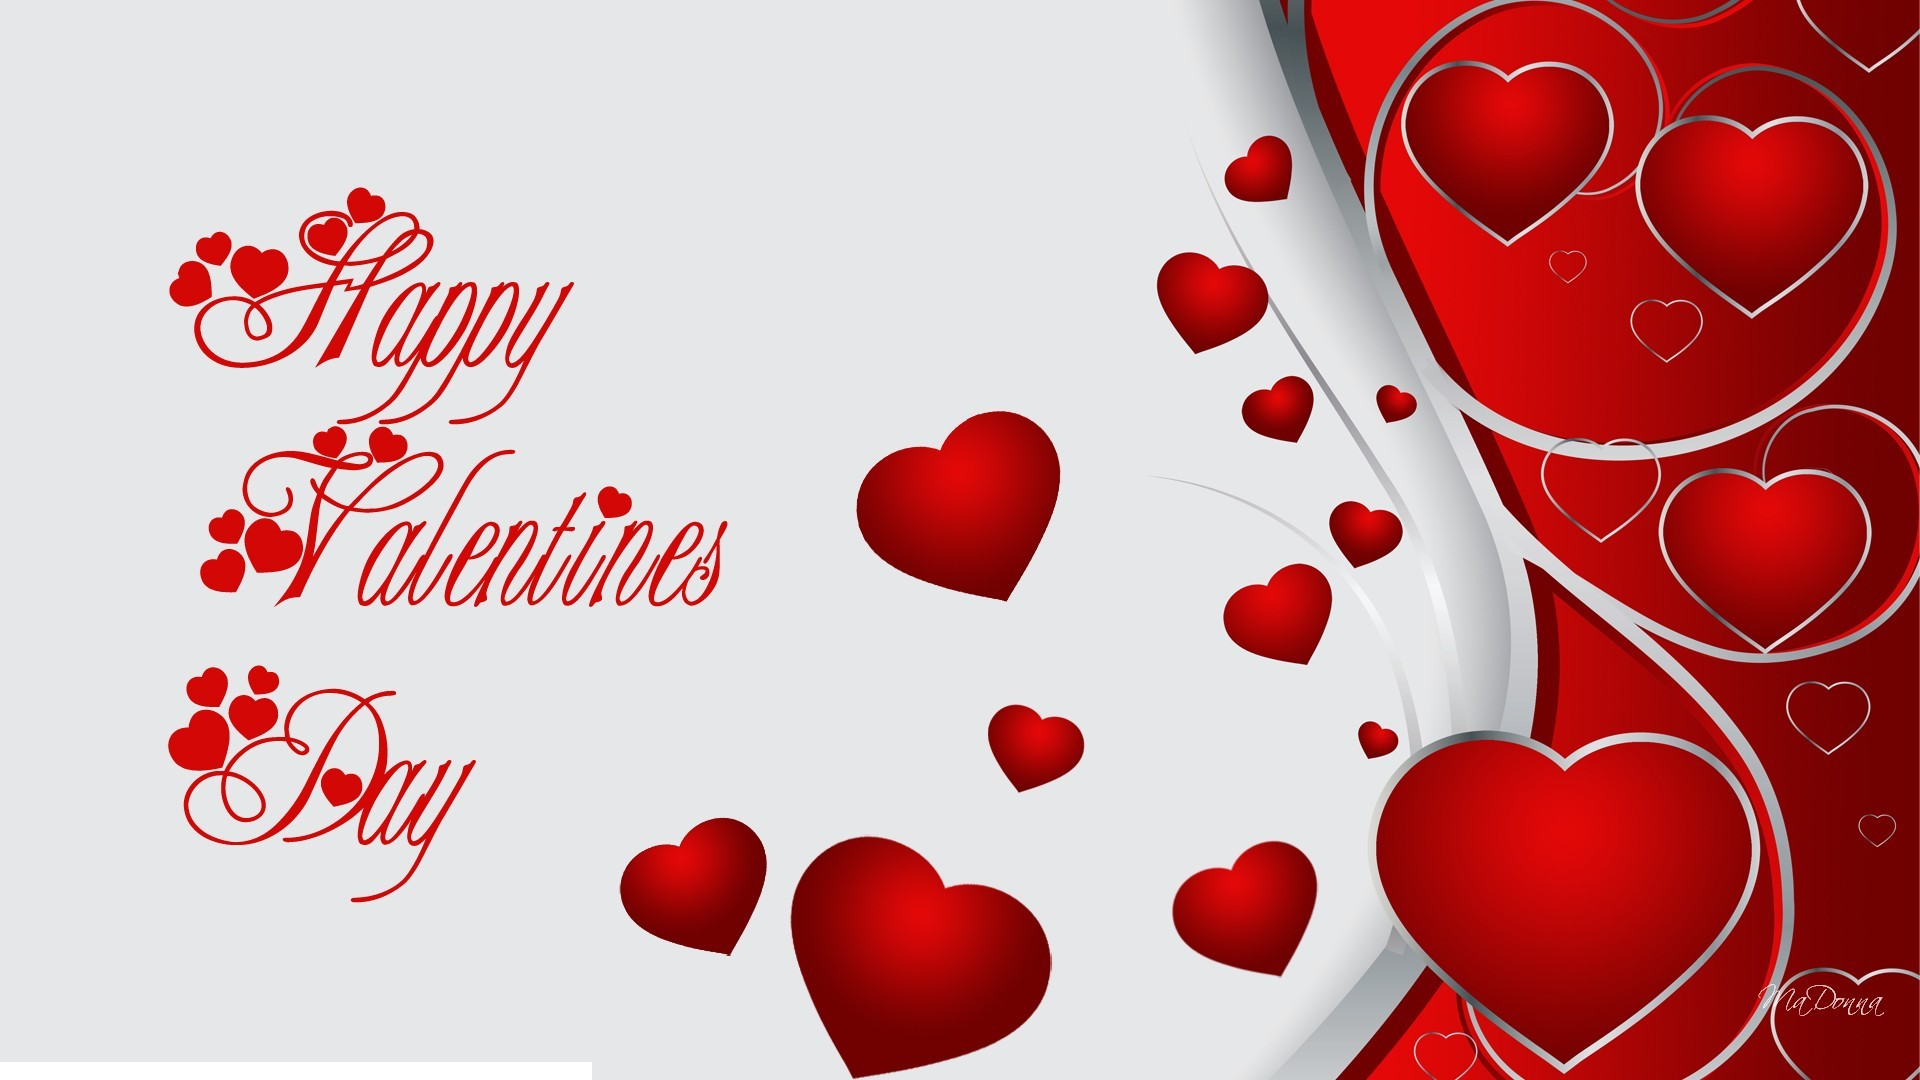 Happy-valentines-day-HD-wallpaper-2016